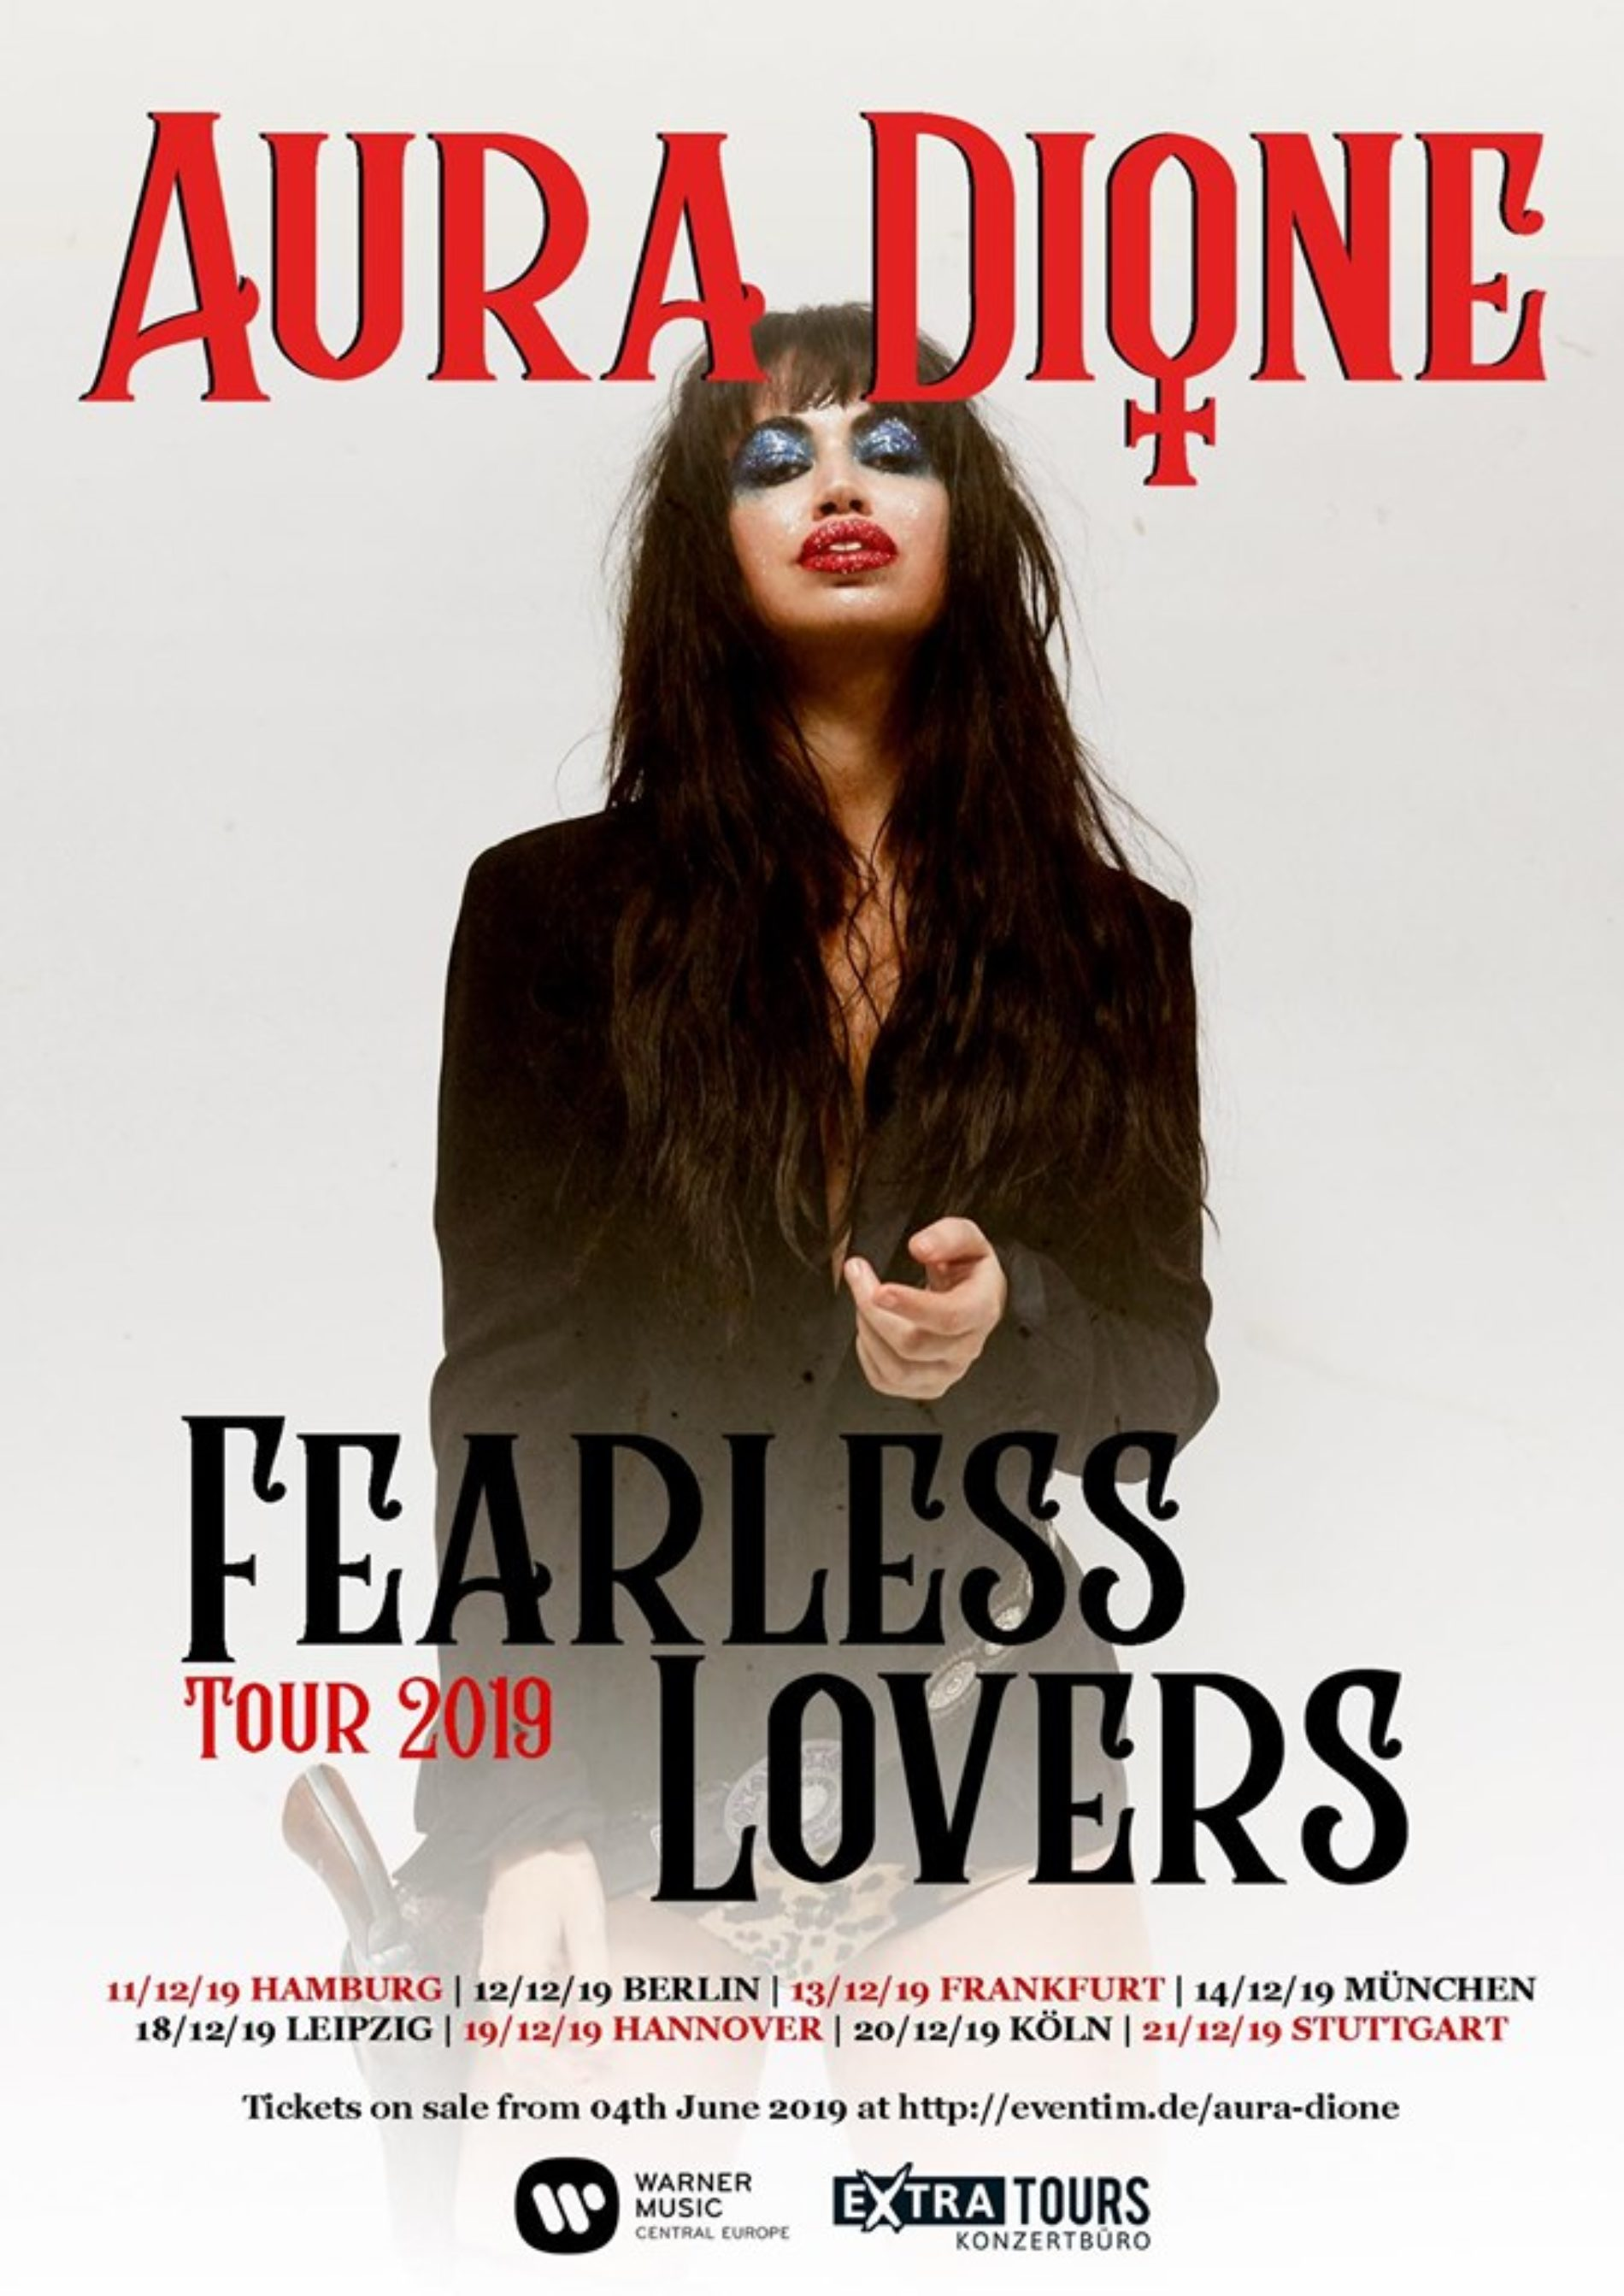 Aura Dione – Fearlass Lovers Tour 2019